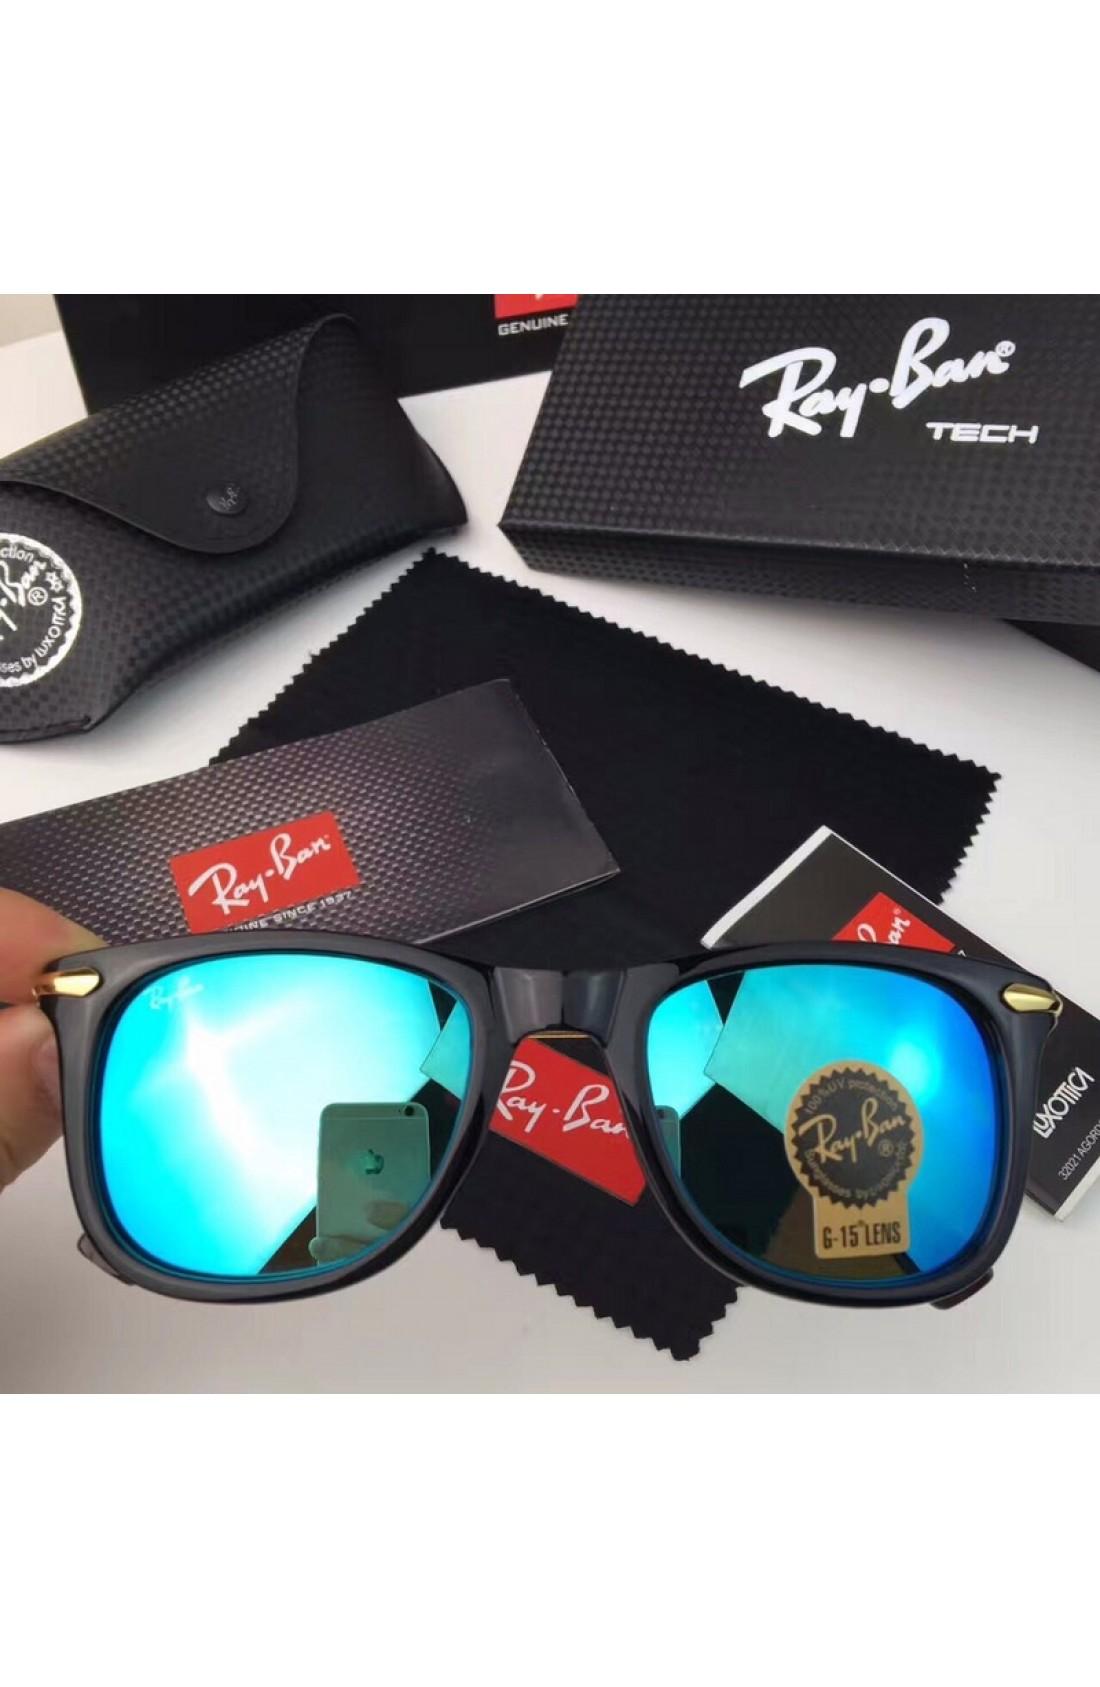 4c6db82a66 Warehouse Sale Men s Women s Ray Ban RB2148 Sunglasses Blue Lenses ...